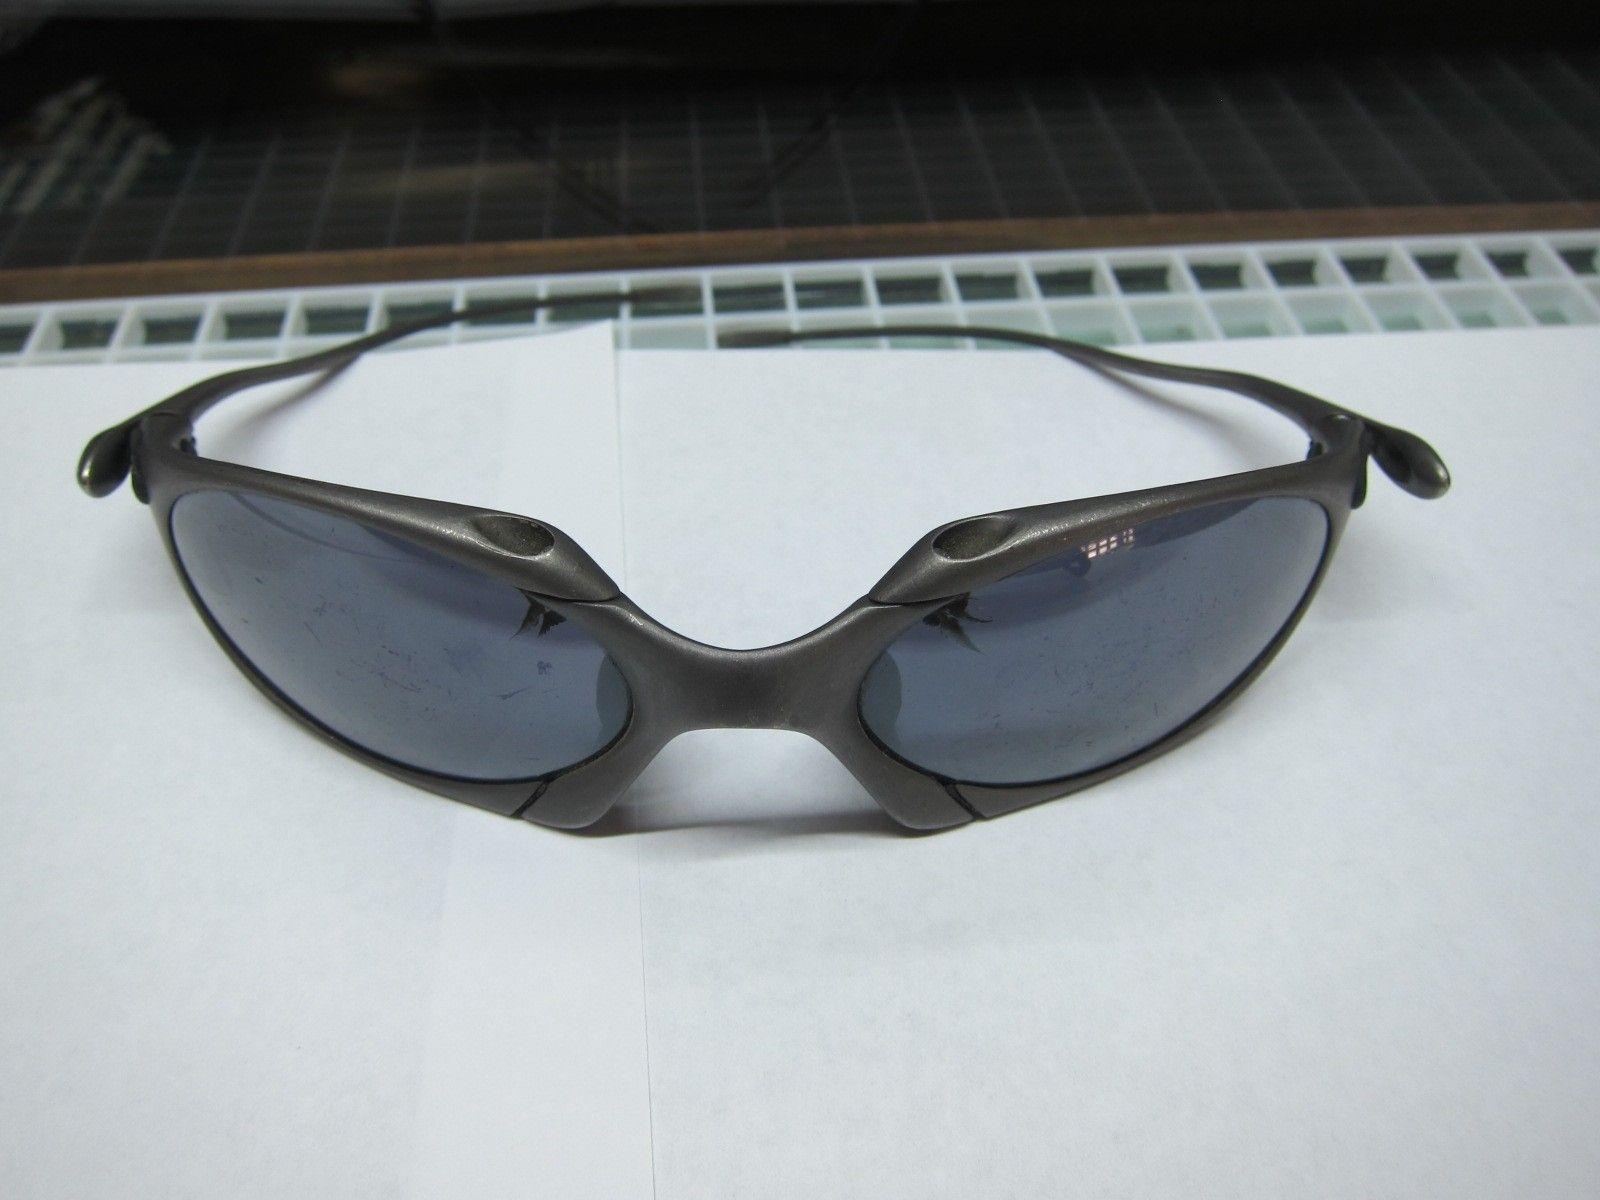 Authentic Oakley Sunglasses 2017